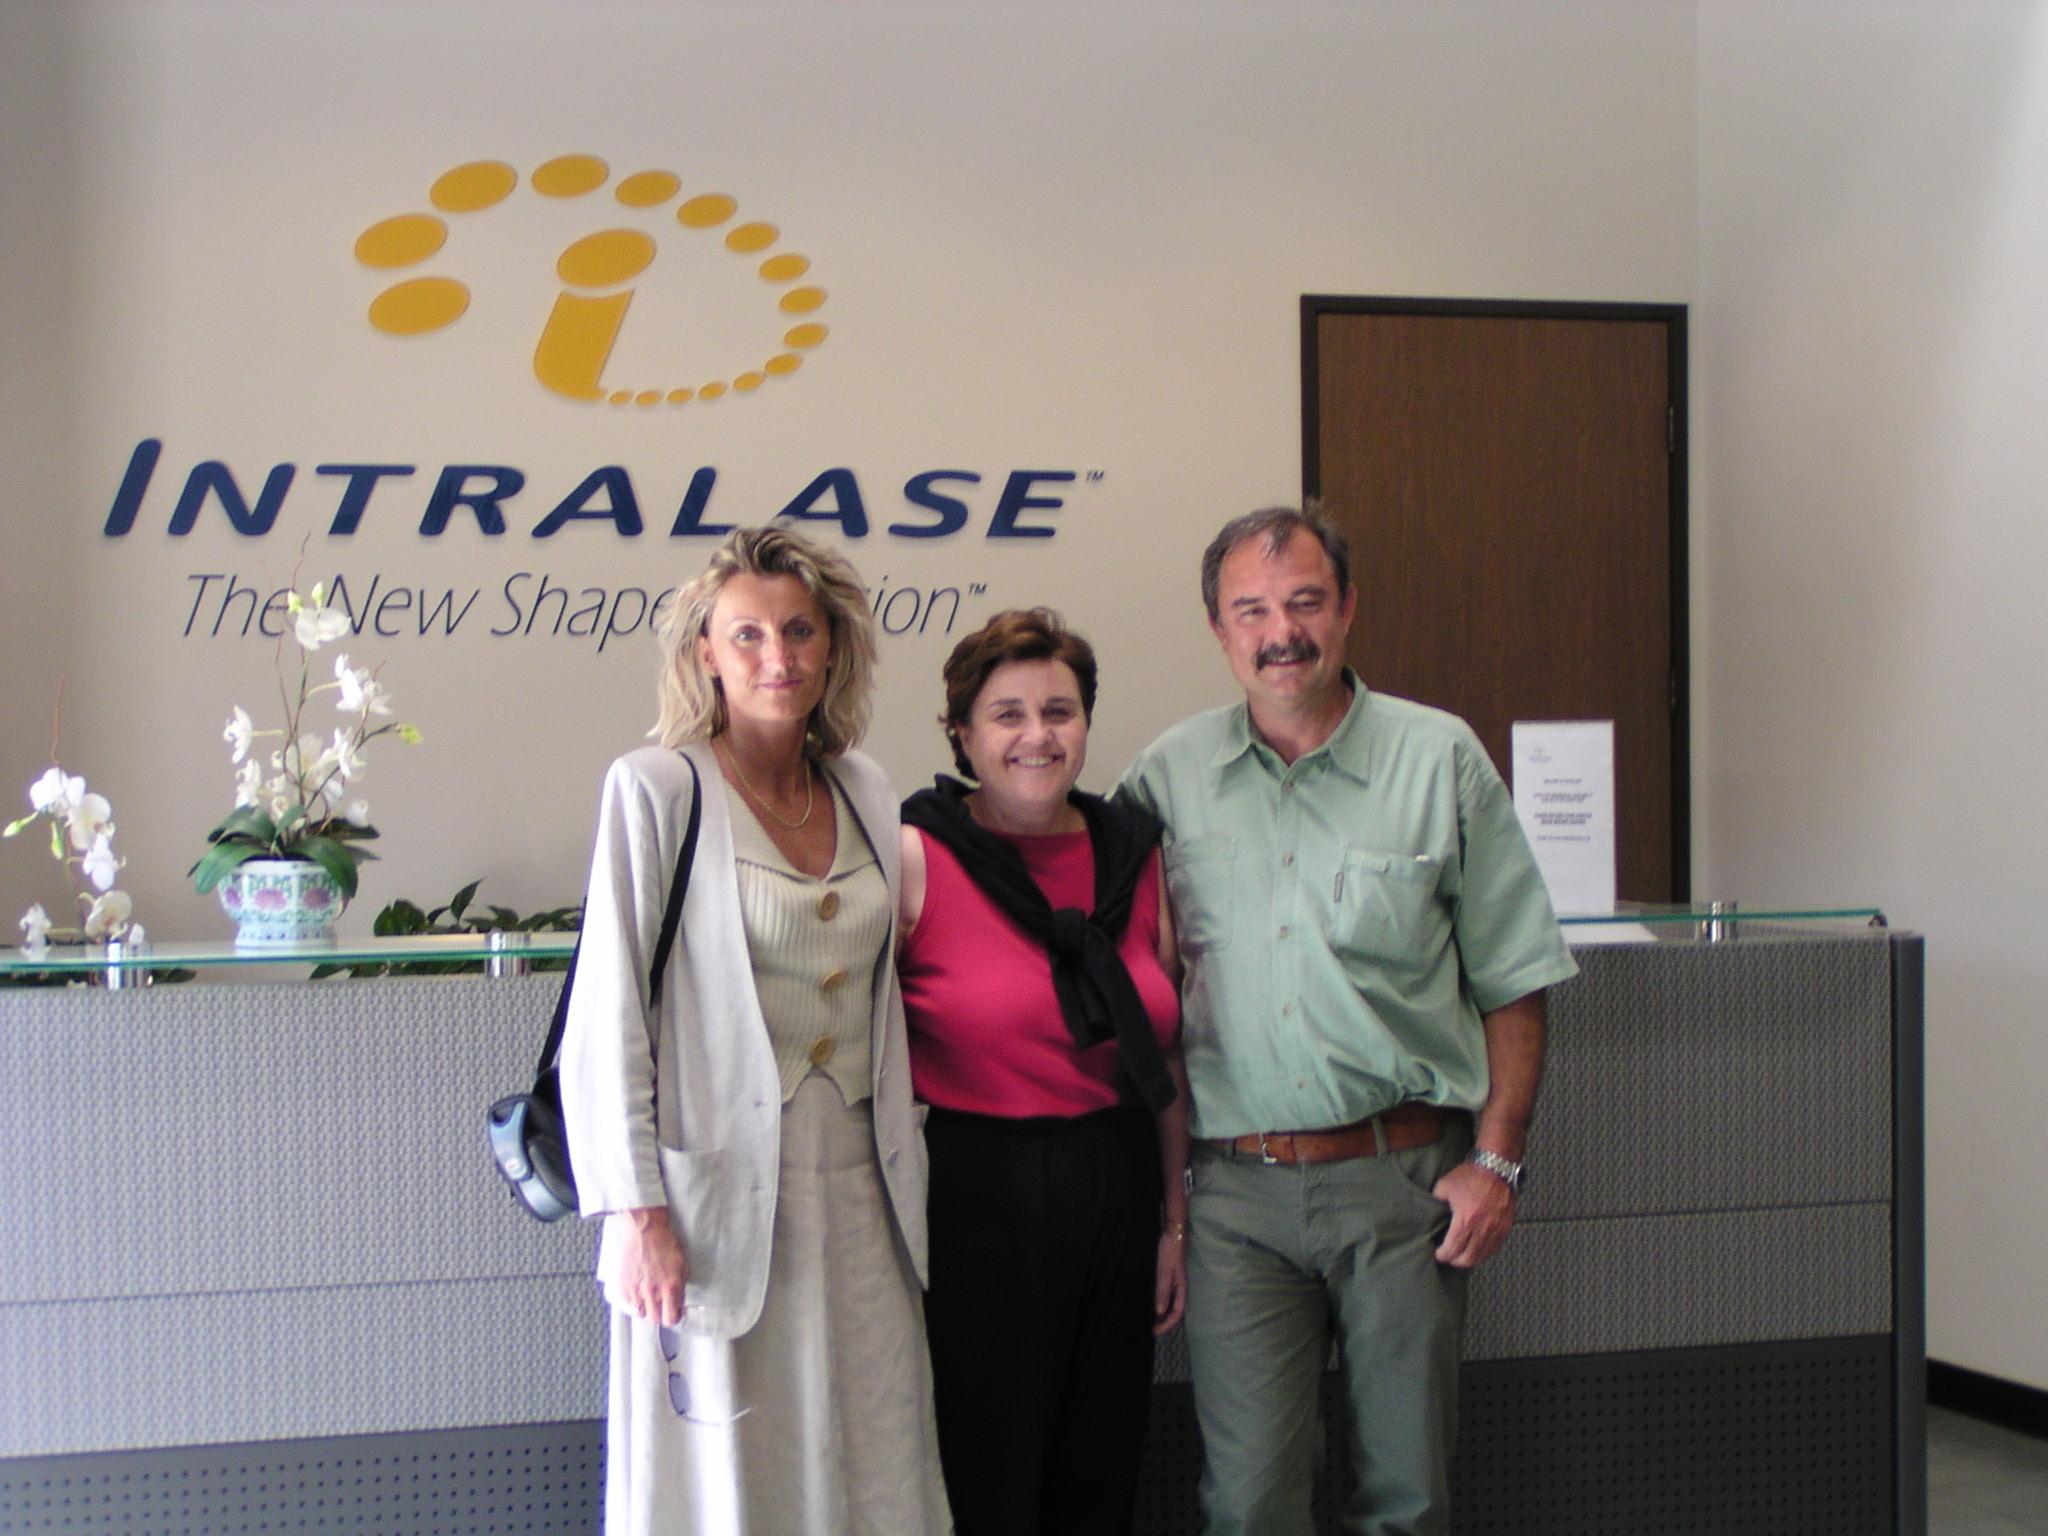 Ratkay Imola, Bor Zsolt, IntraLase Irvine USA